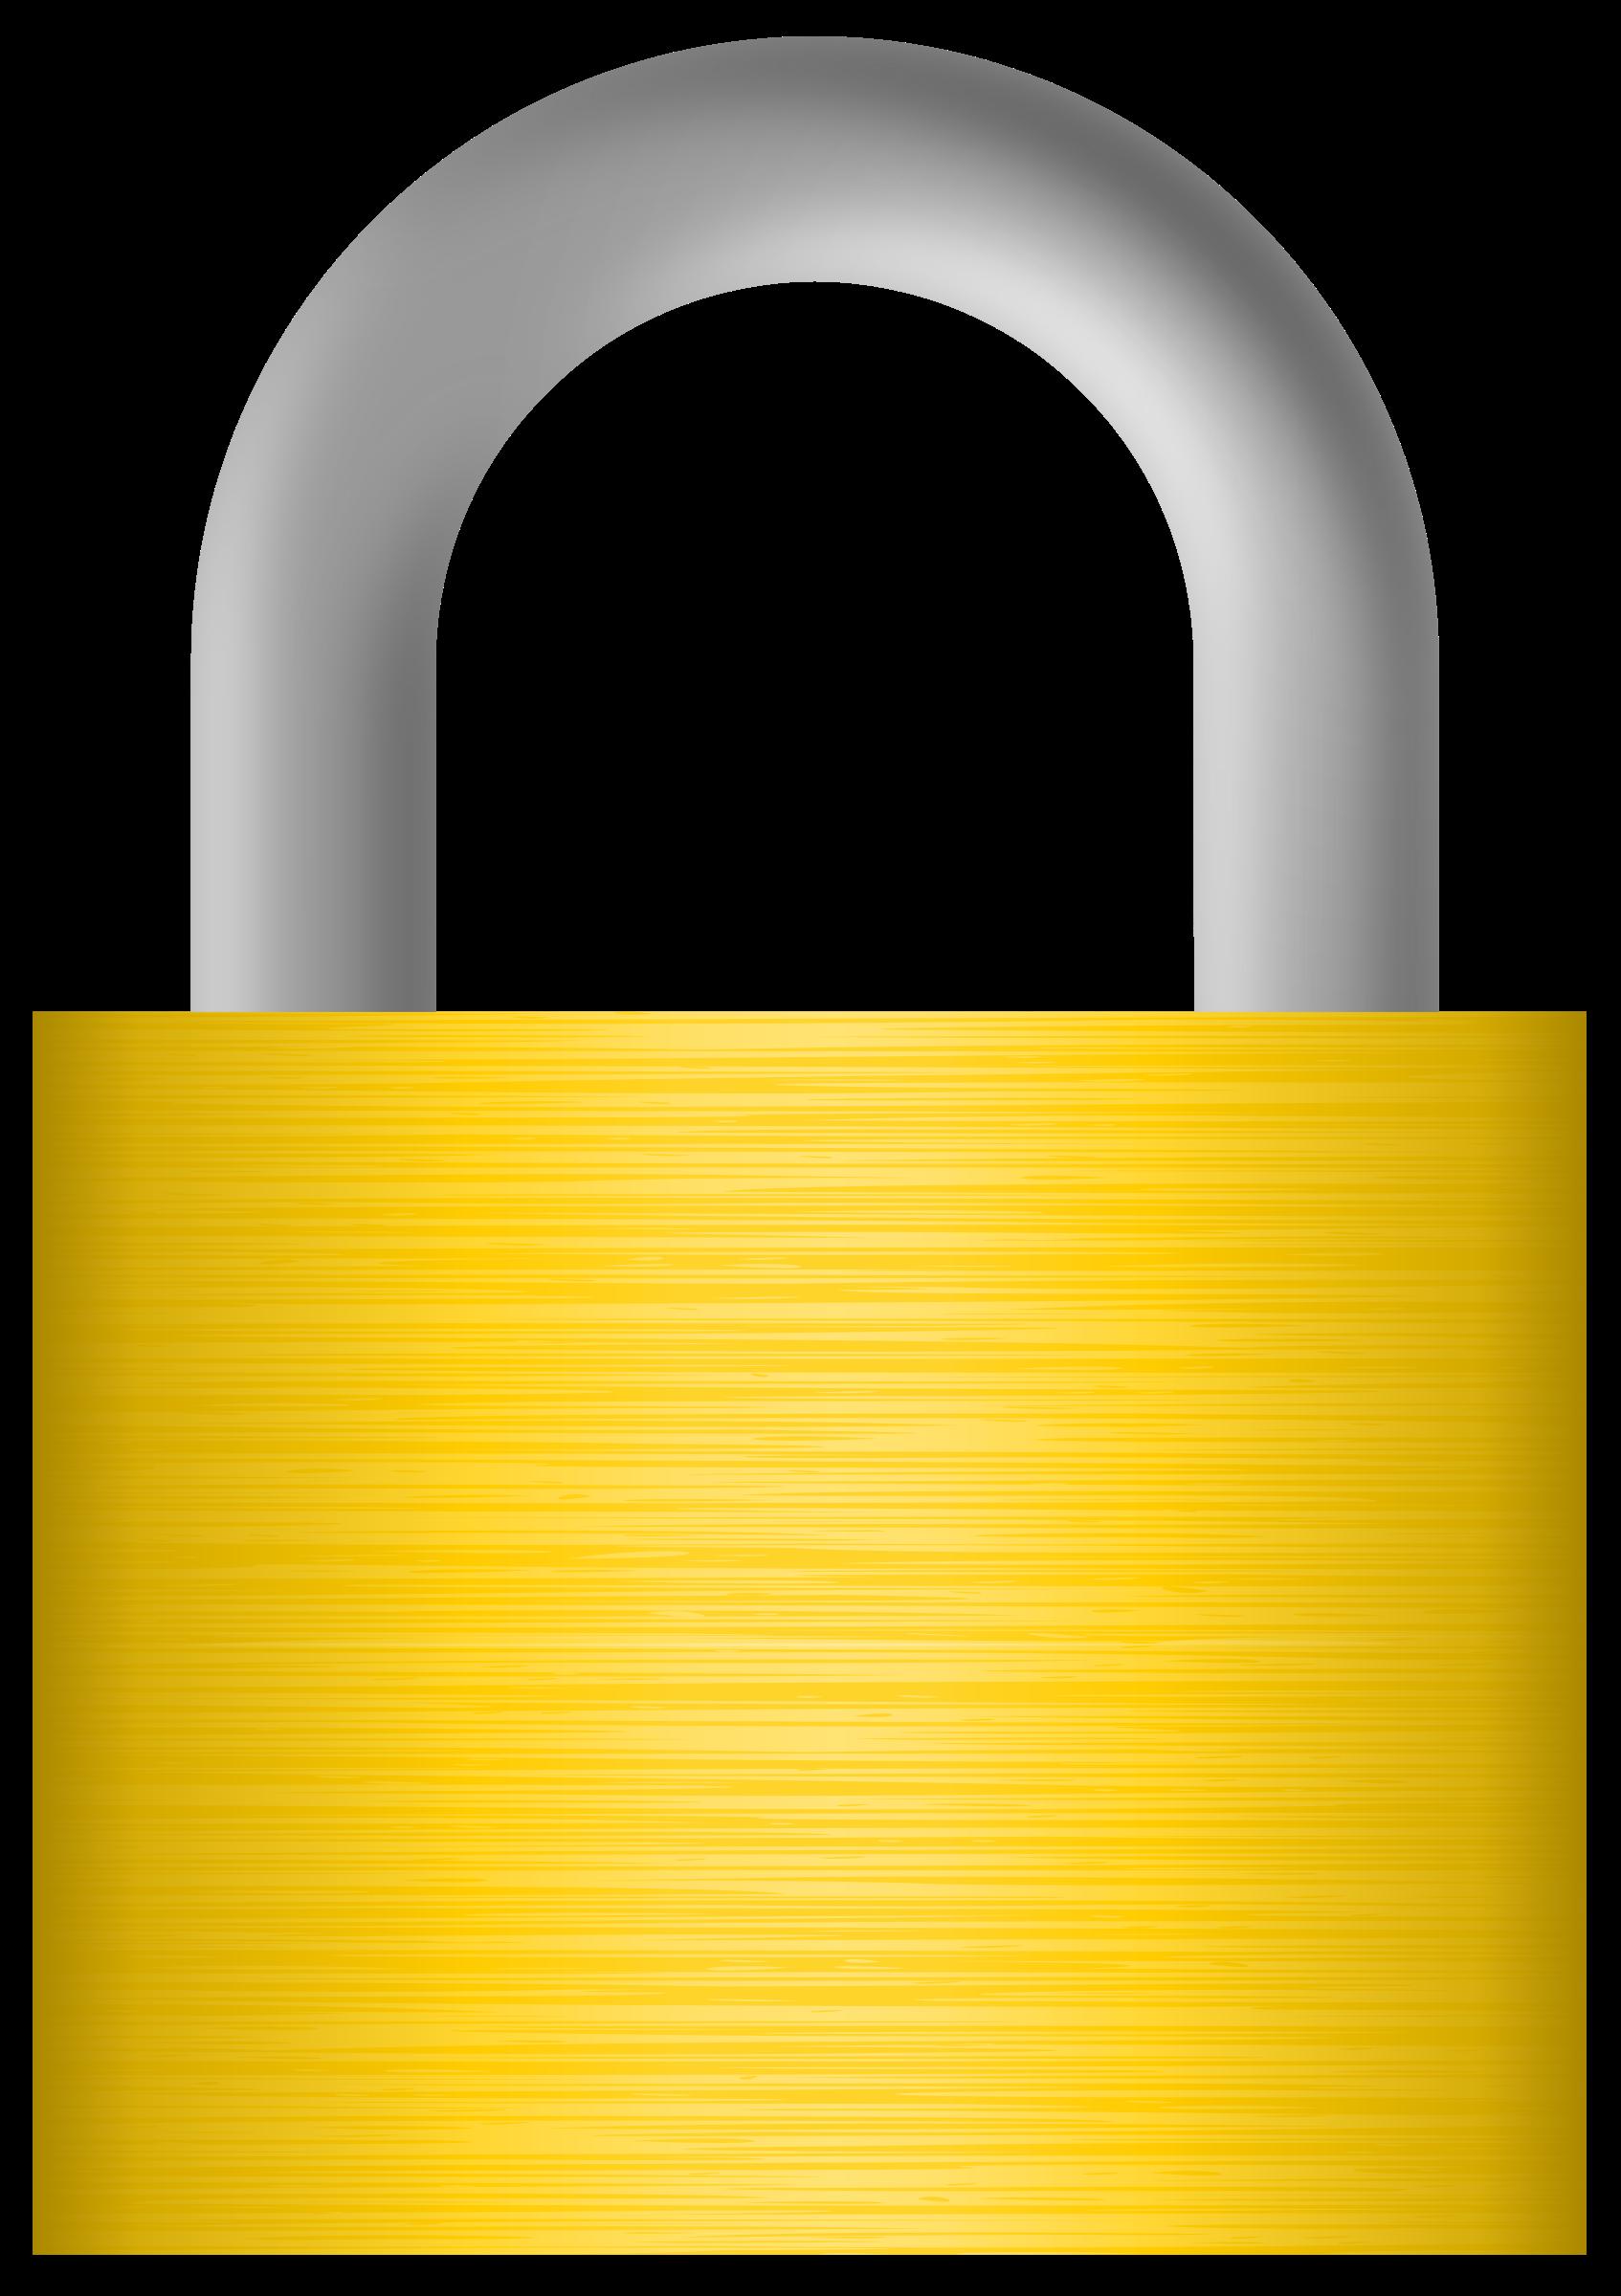 lock clipart school